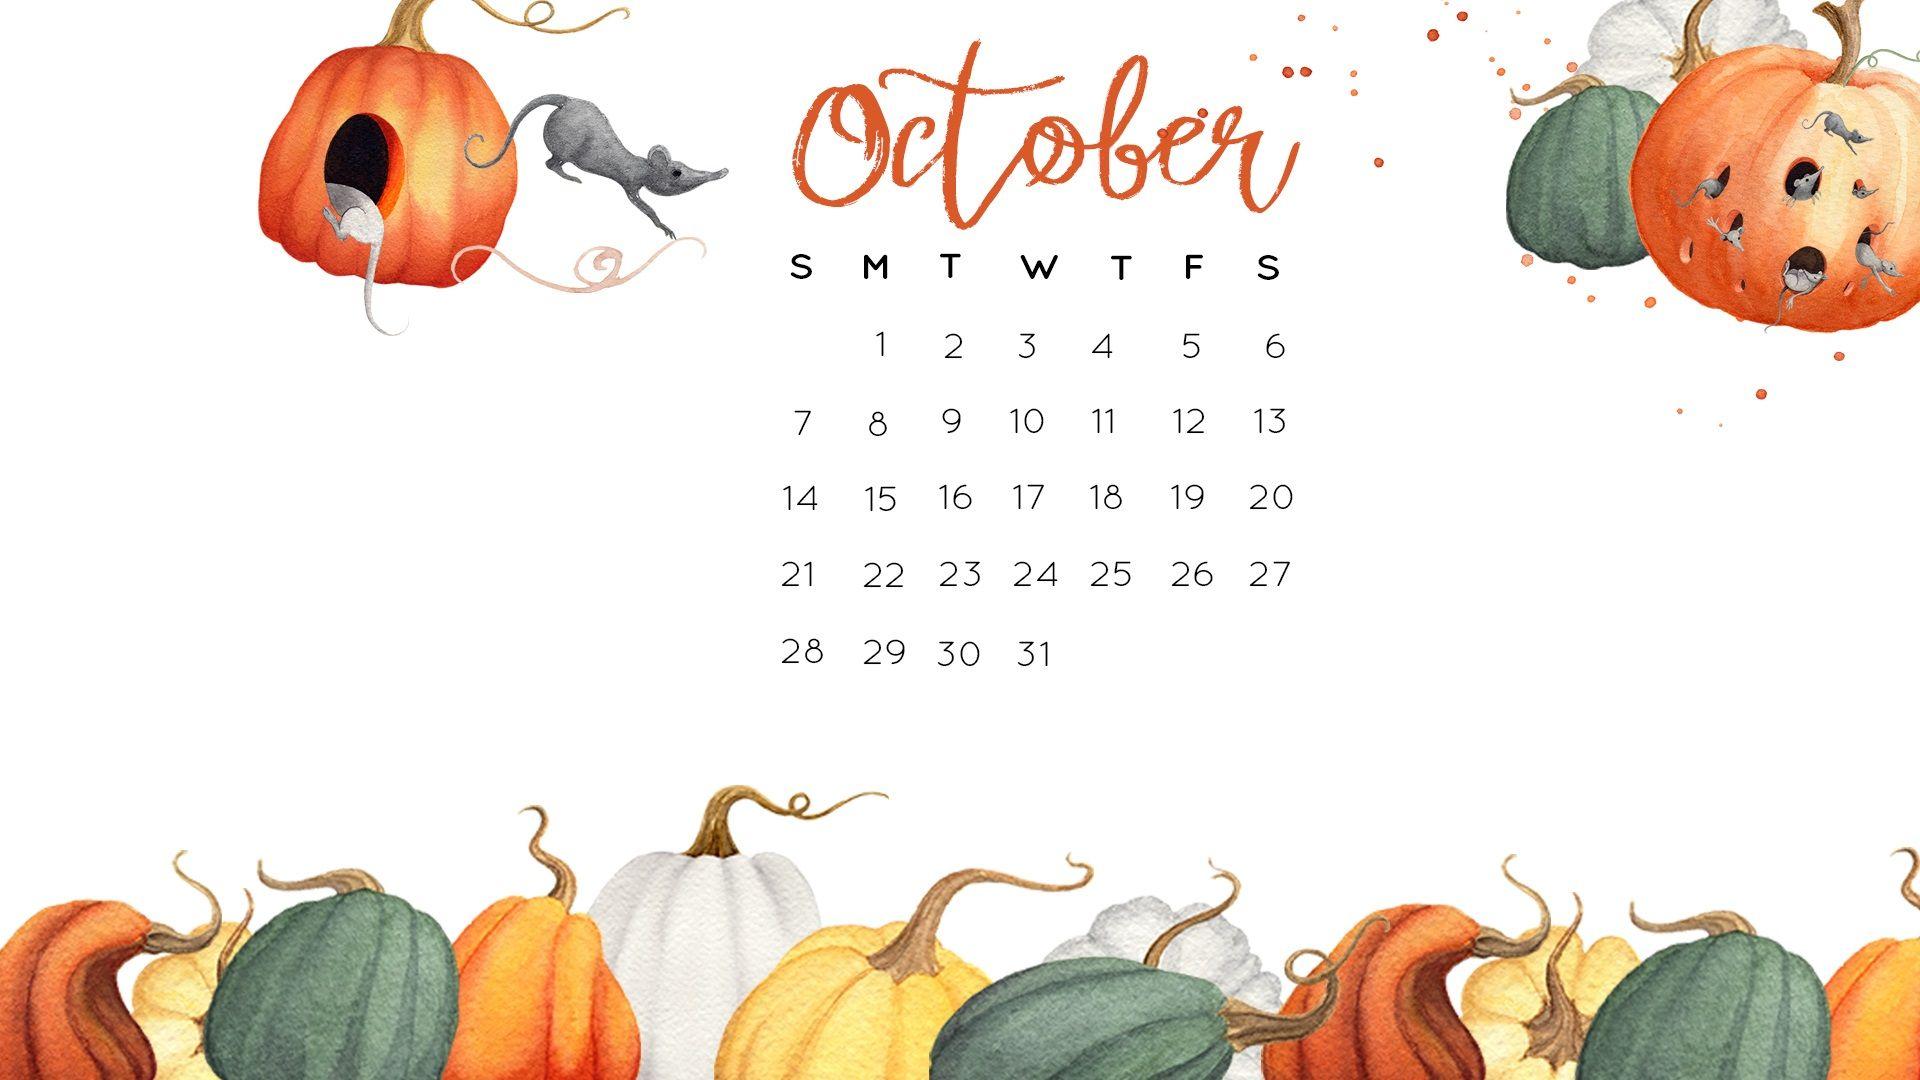 October Desktop Calendar 2018 Jpg 1 920 1 080 Pixels October Wallpaper Desktop Calendar